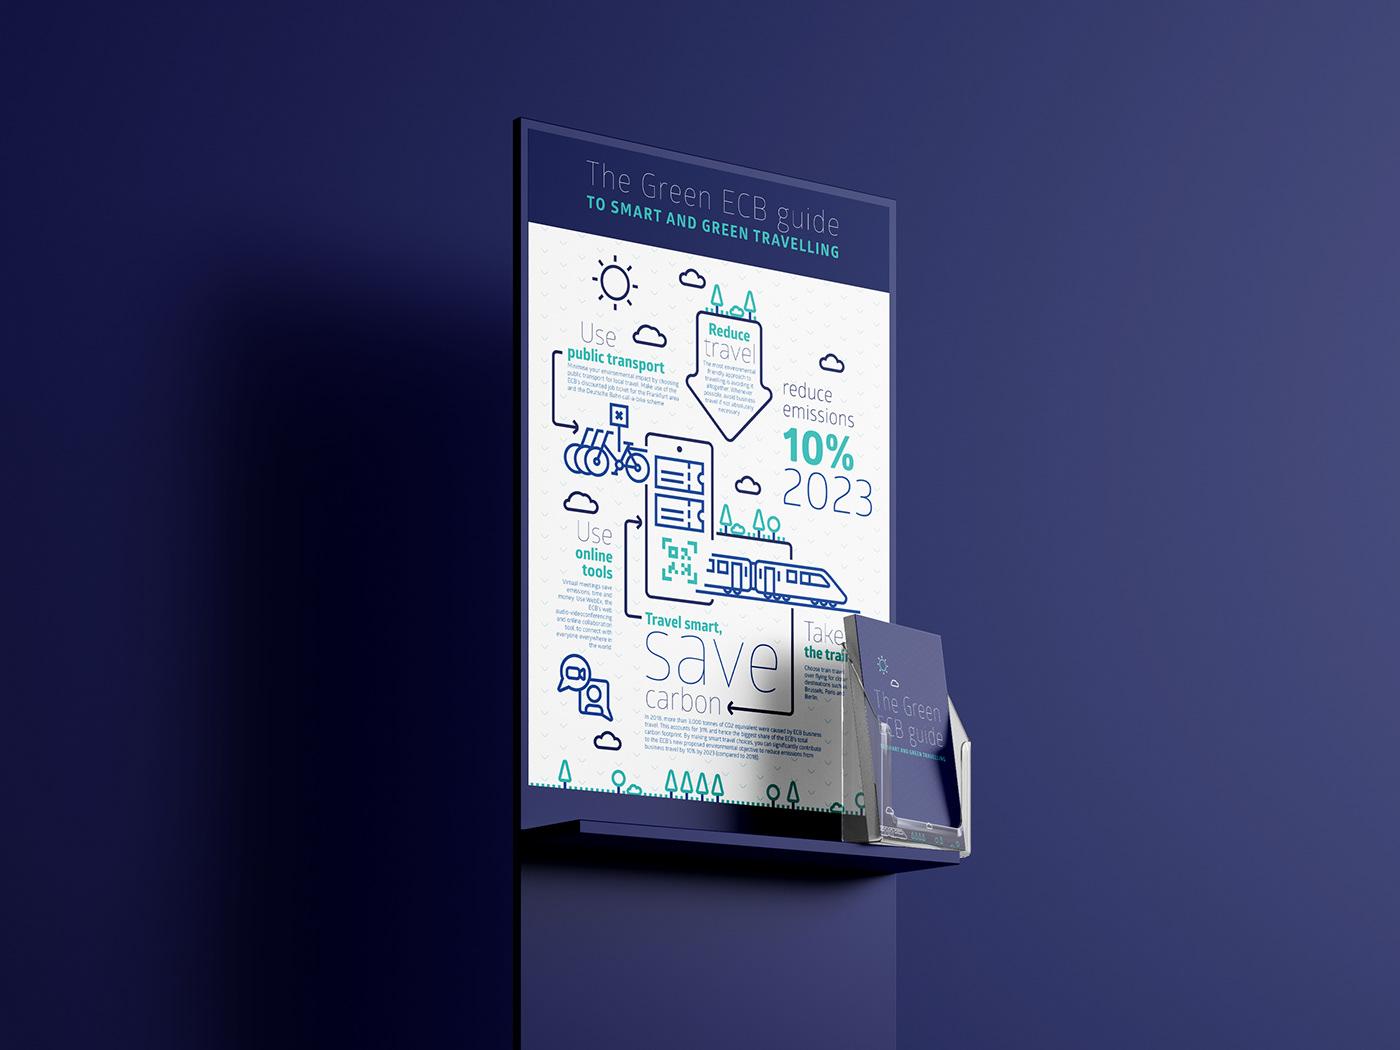 banco Bank europa Europe Iconos icons infografia infographic institucion institution